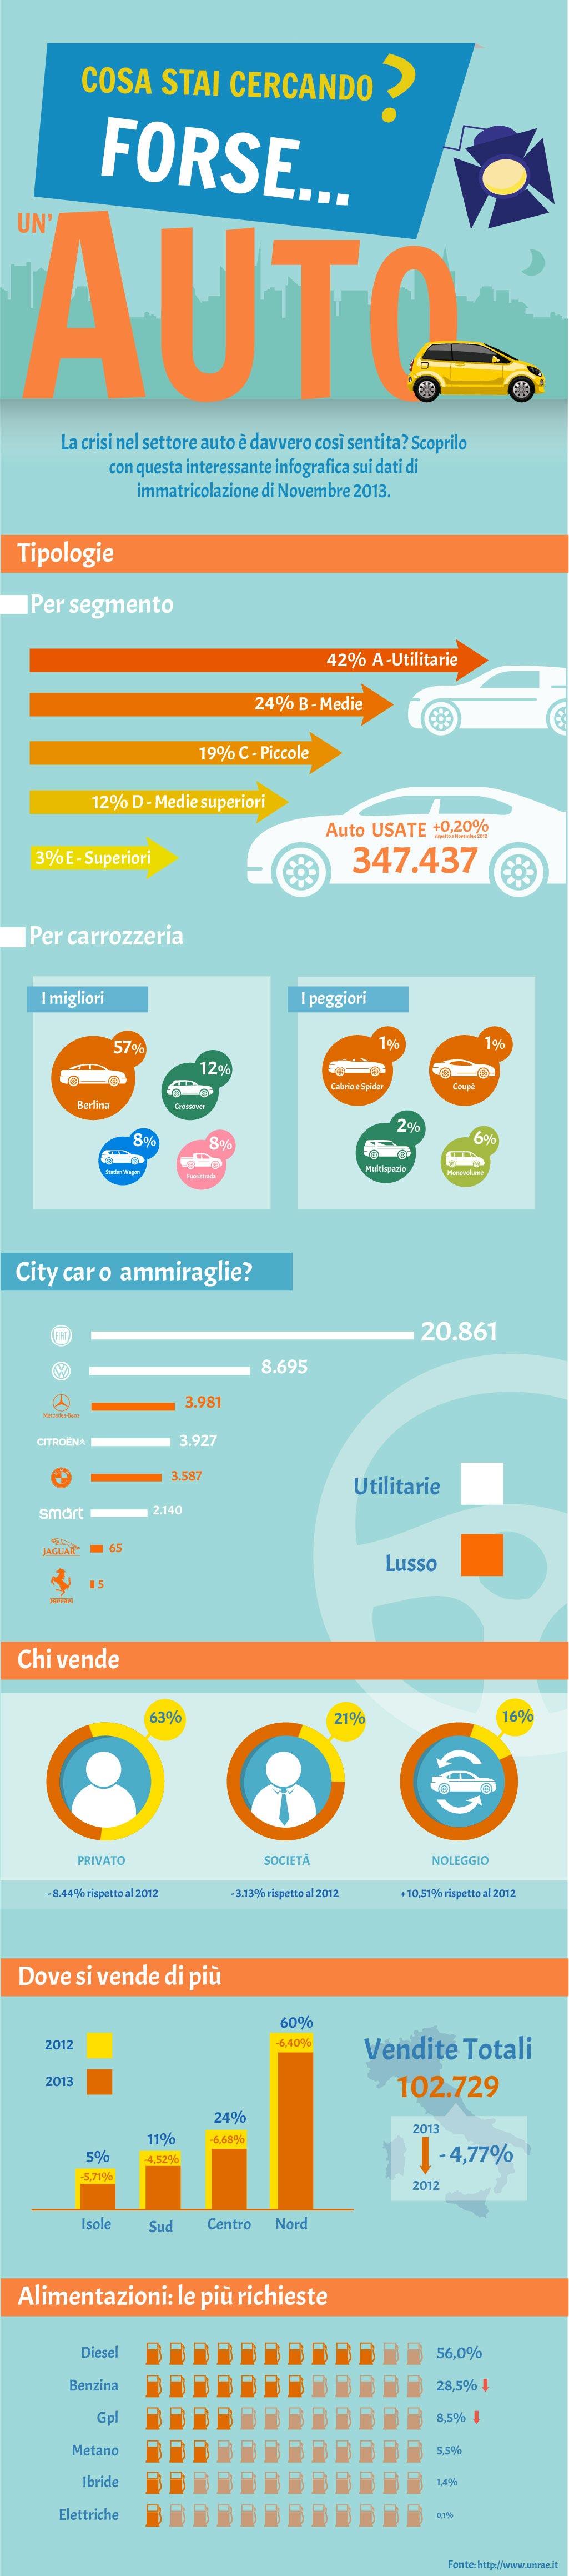 Infografica crisi auto